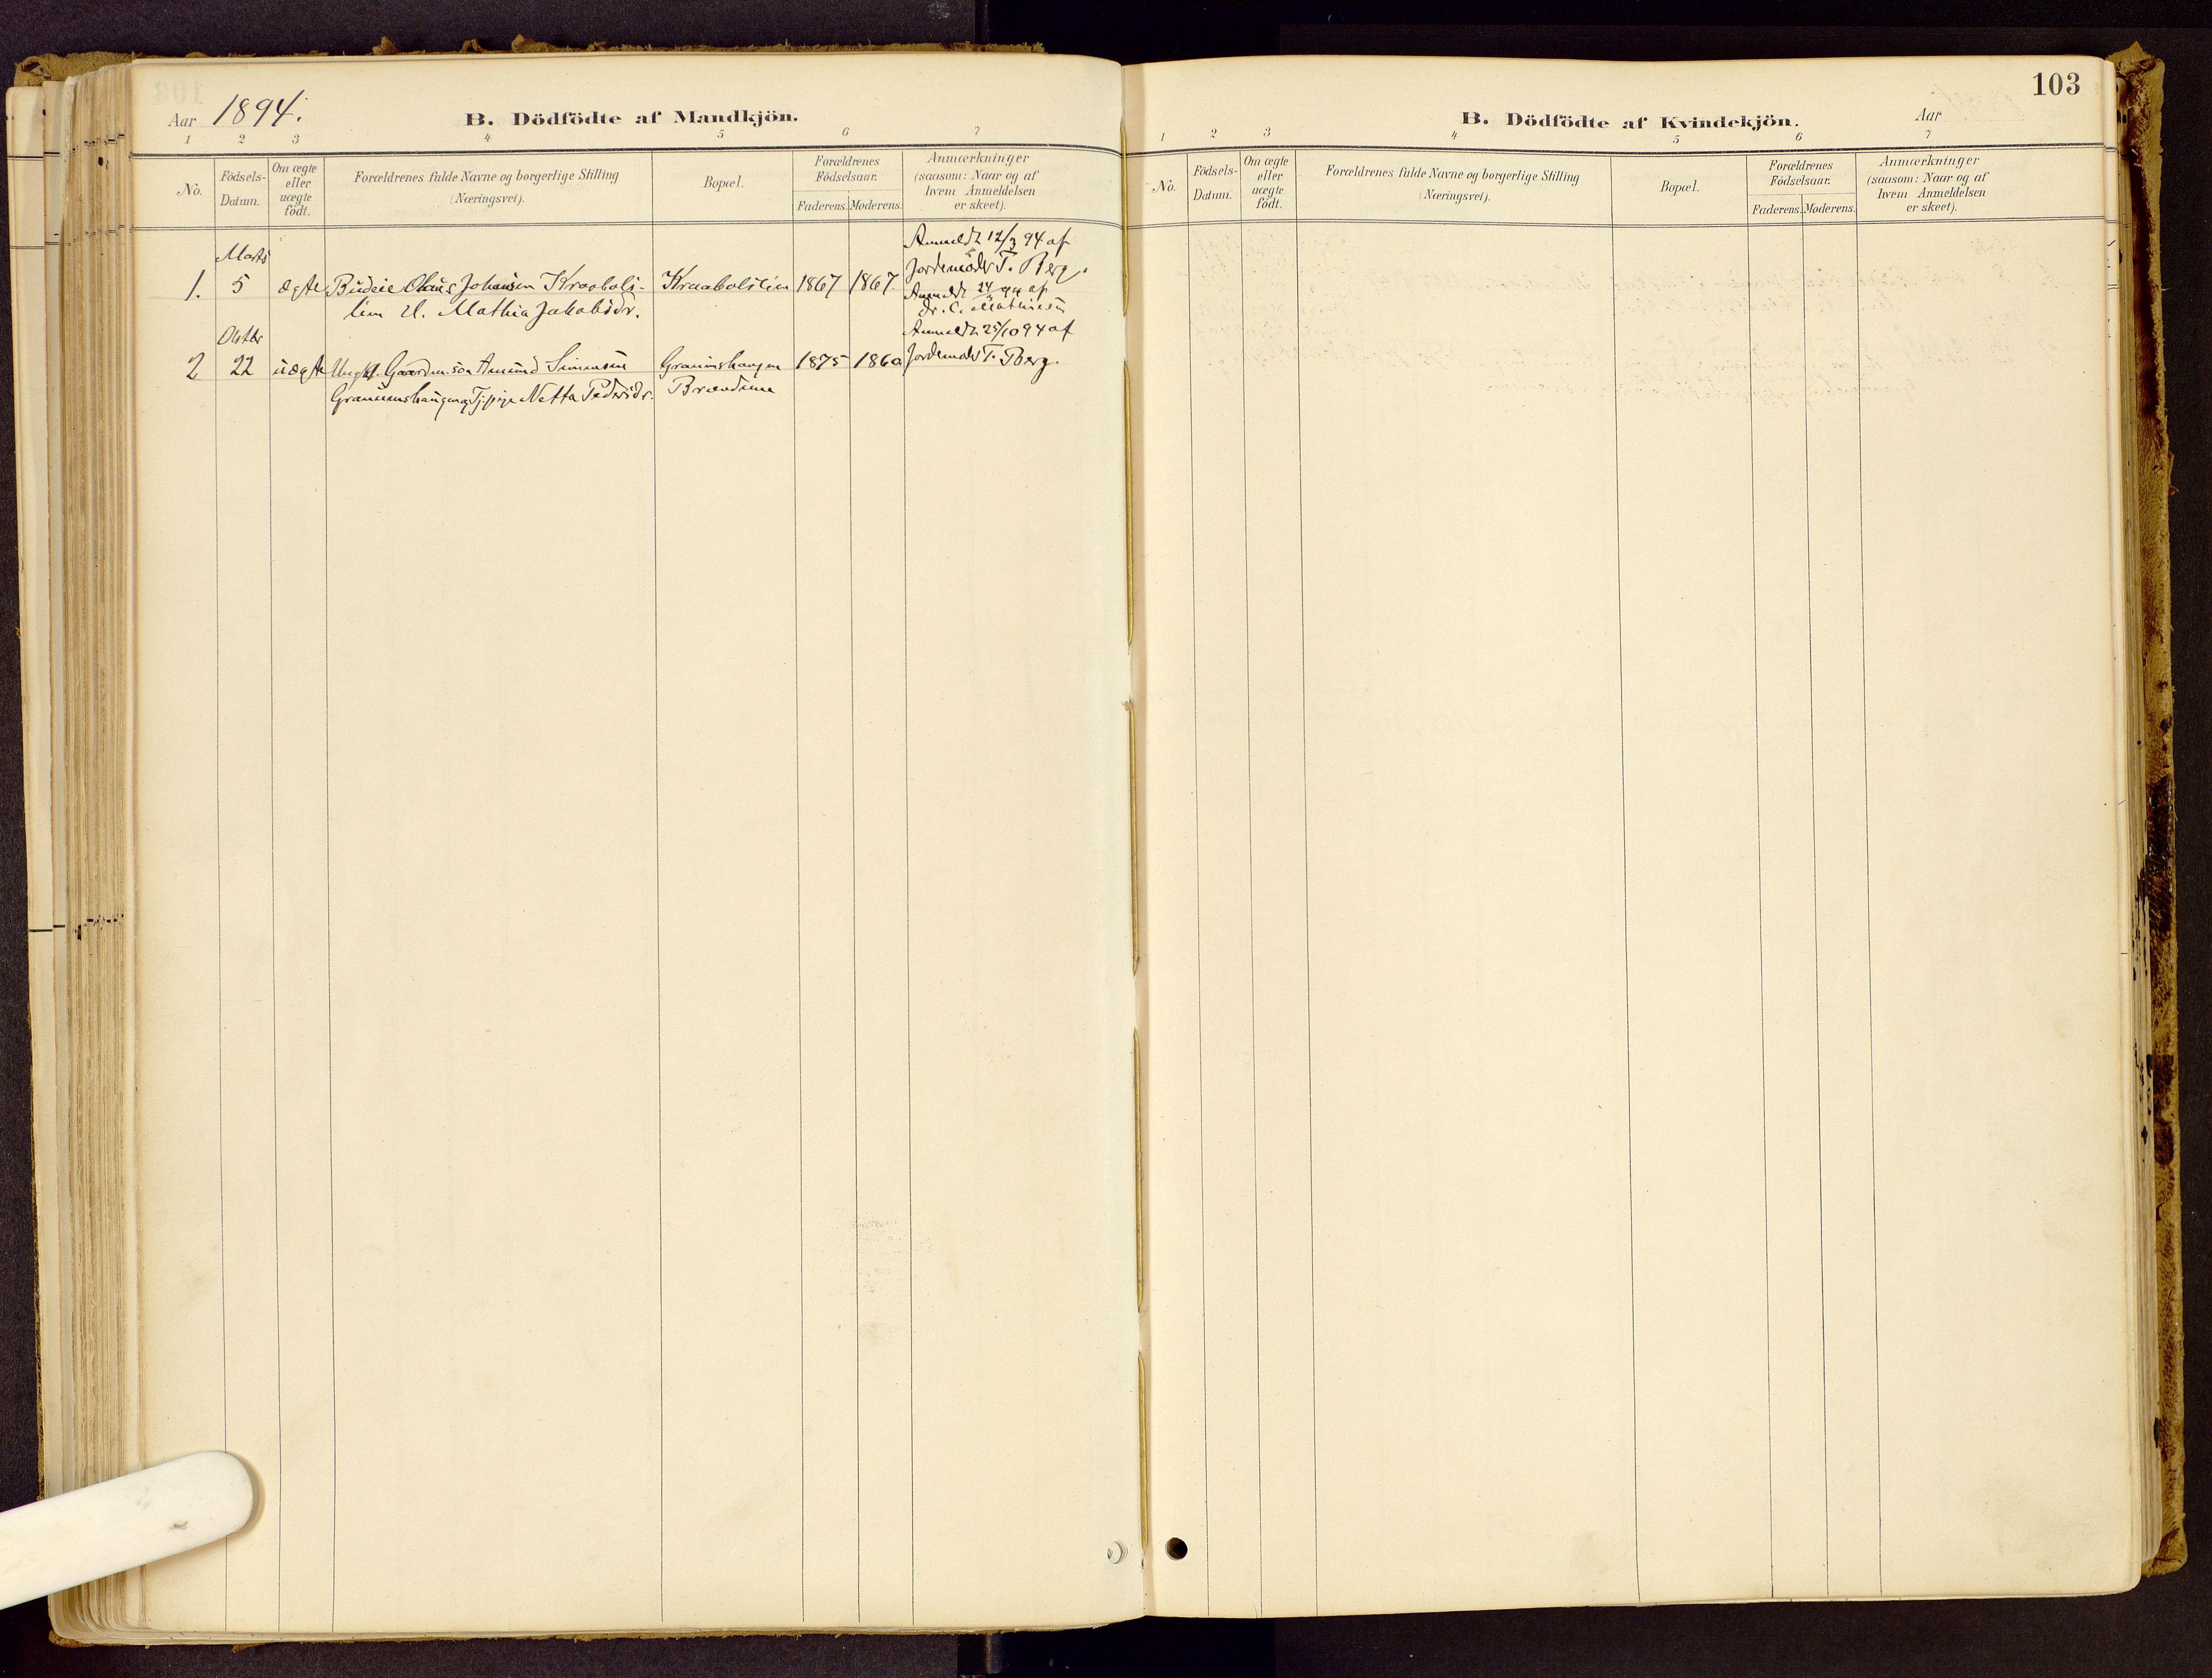 SAH, Vestre Gausdal prestekontor, Ministerialbok nr. 1, 1887-1914, s. 103